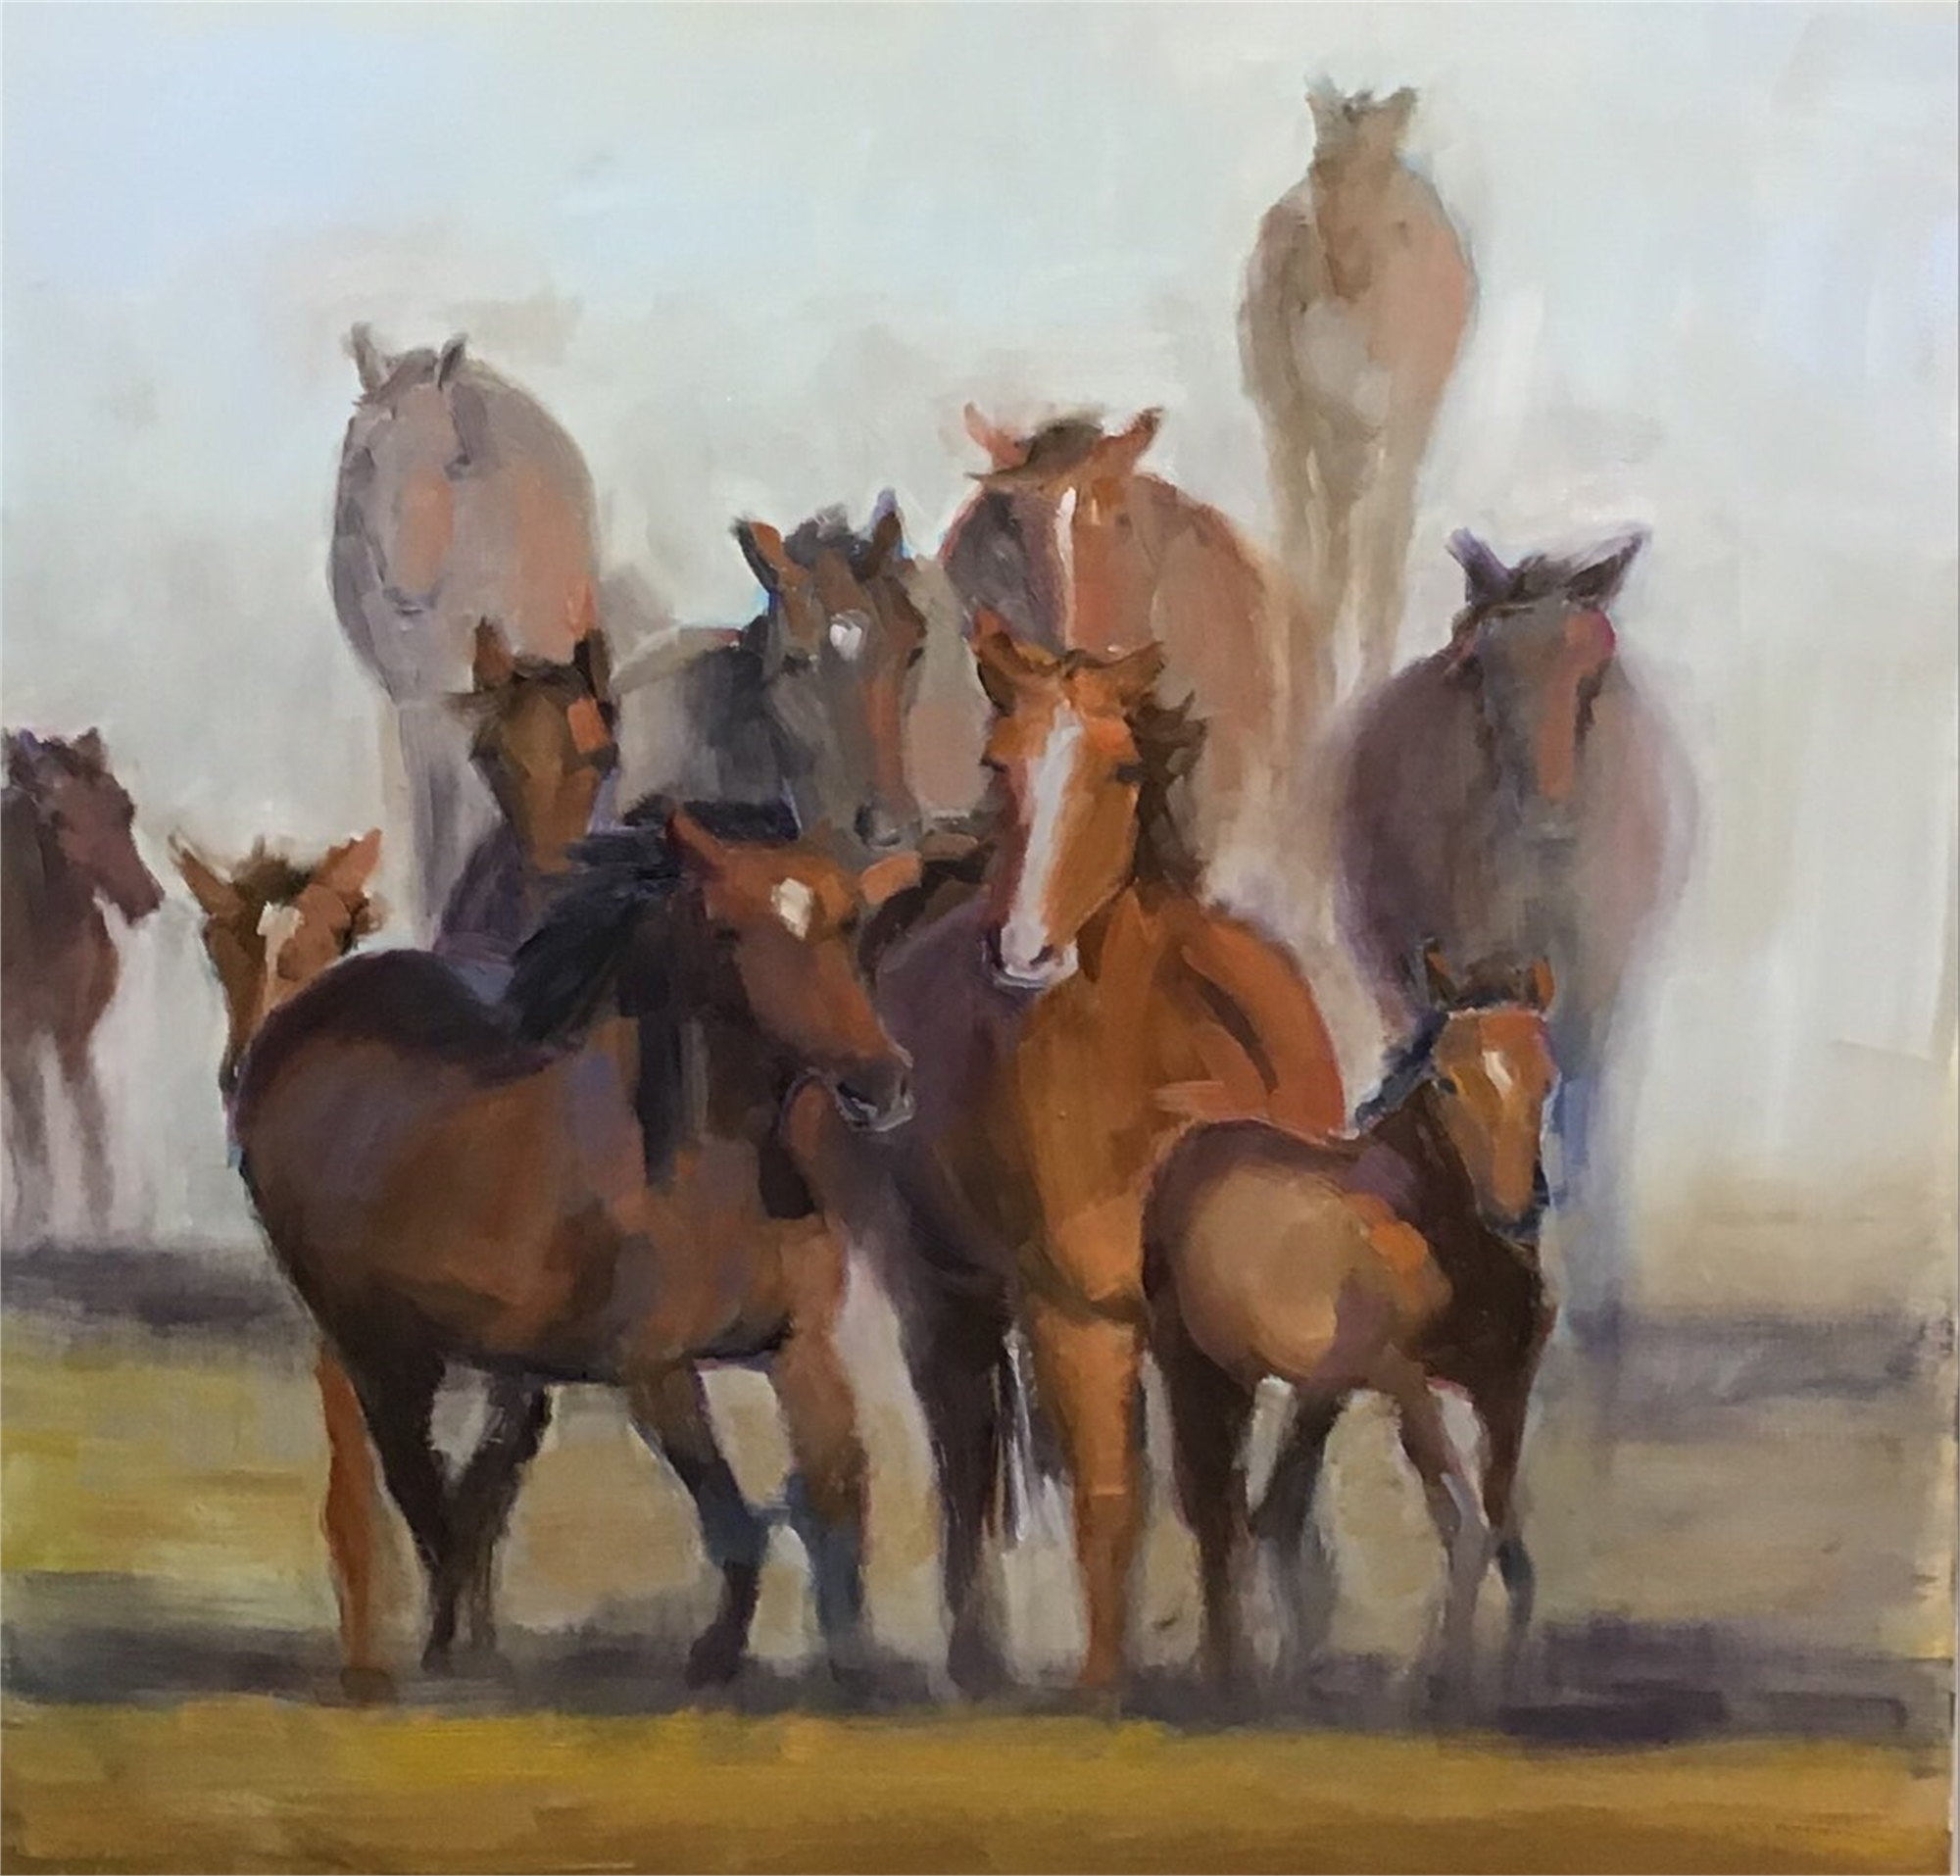 Afternoon Run by Susan Westmoreland